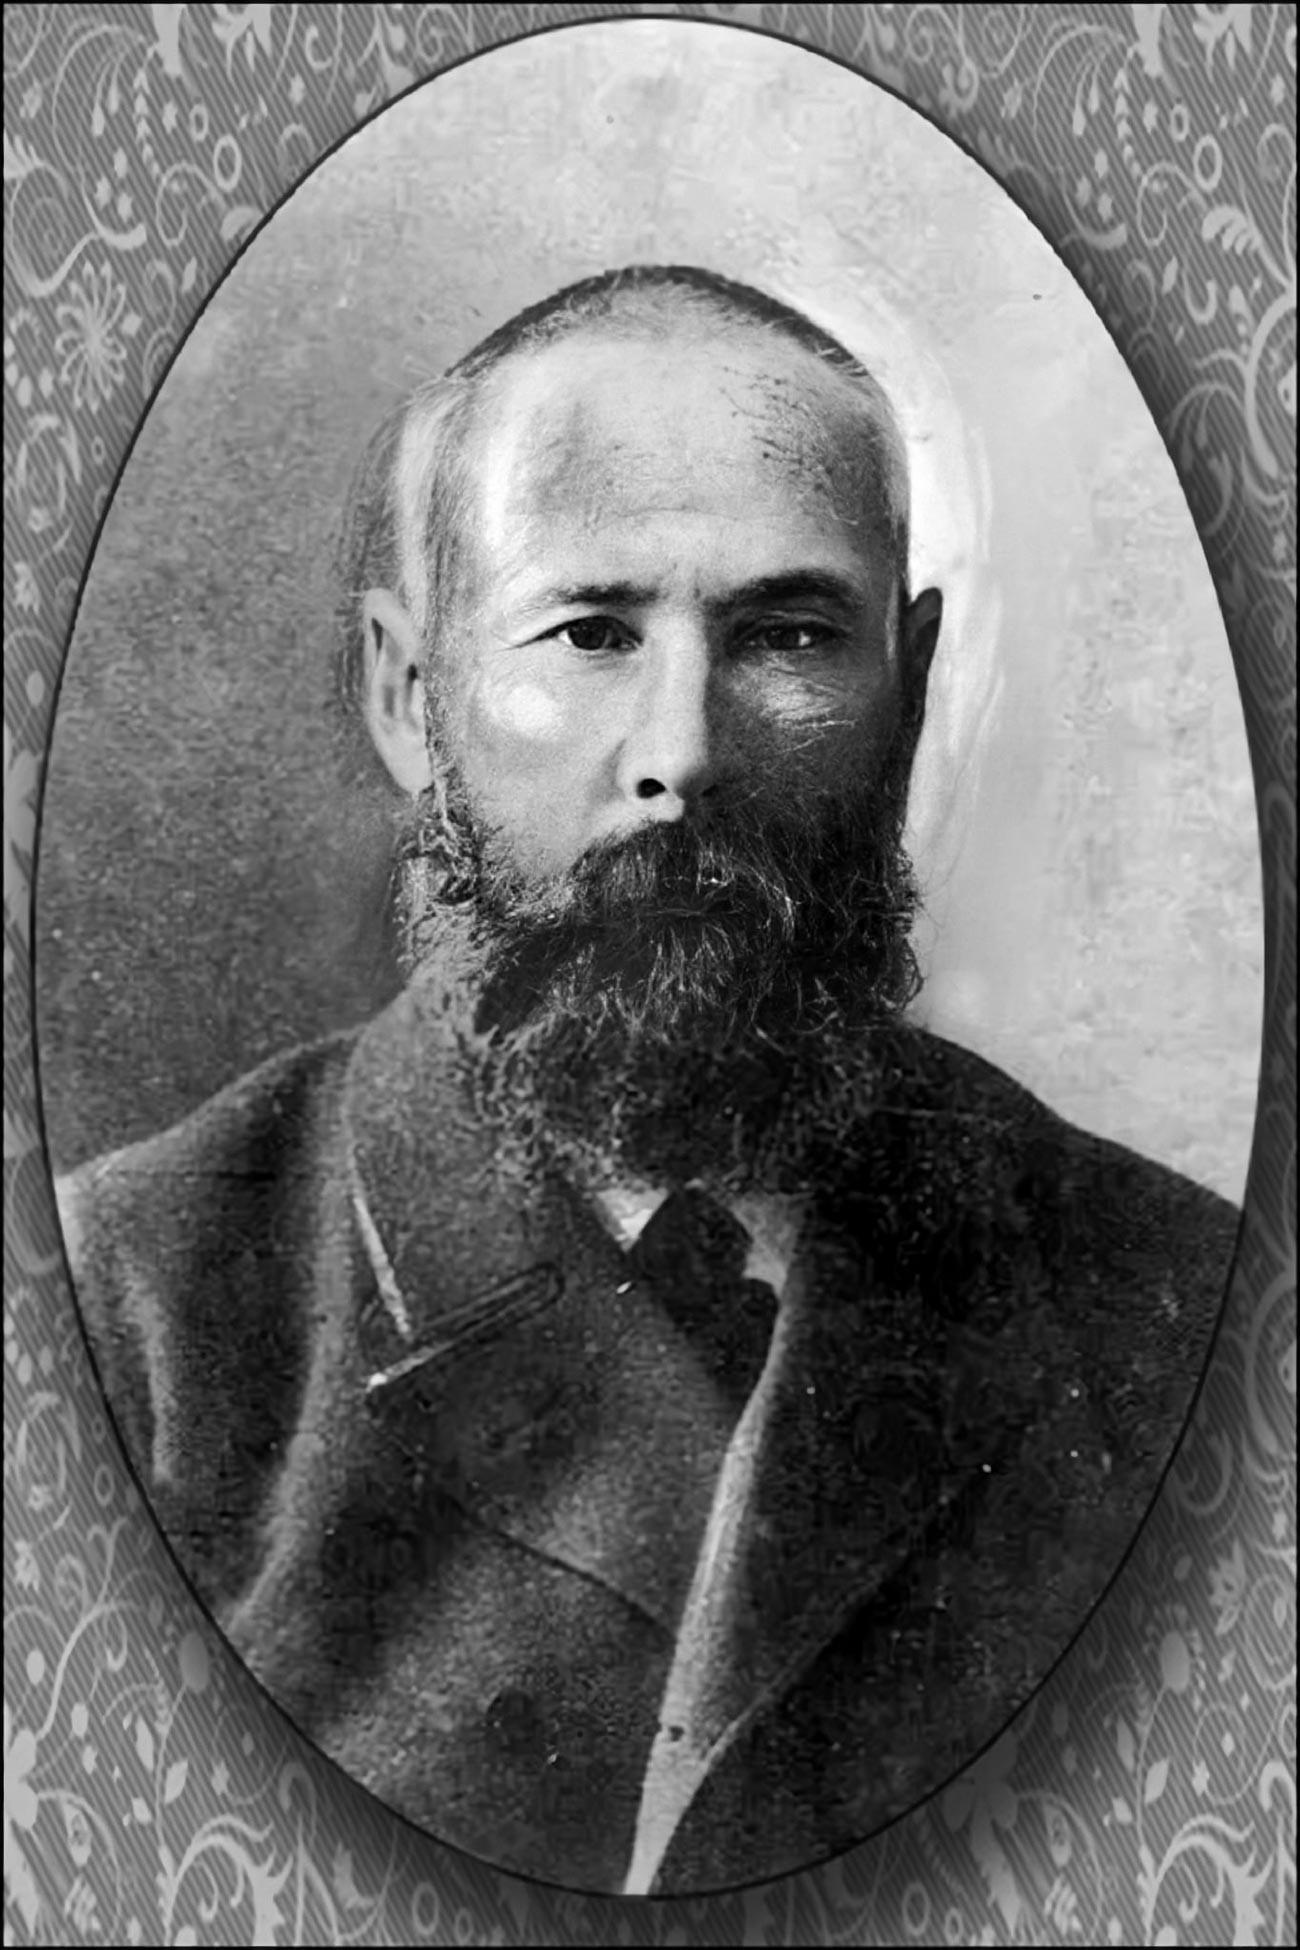 Mikhaïl Yankovski